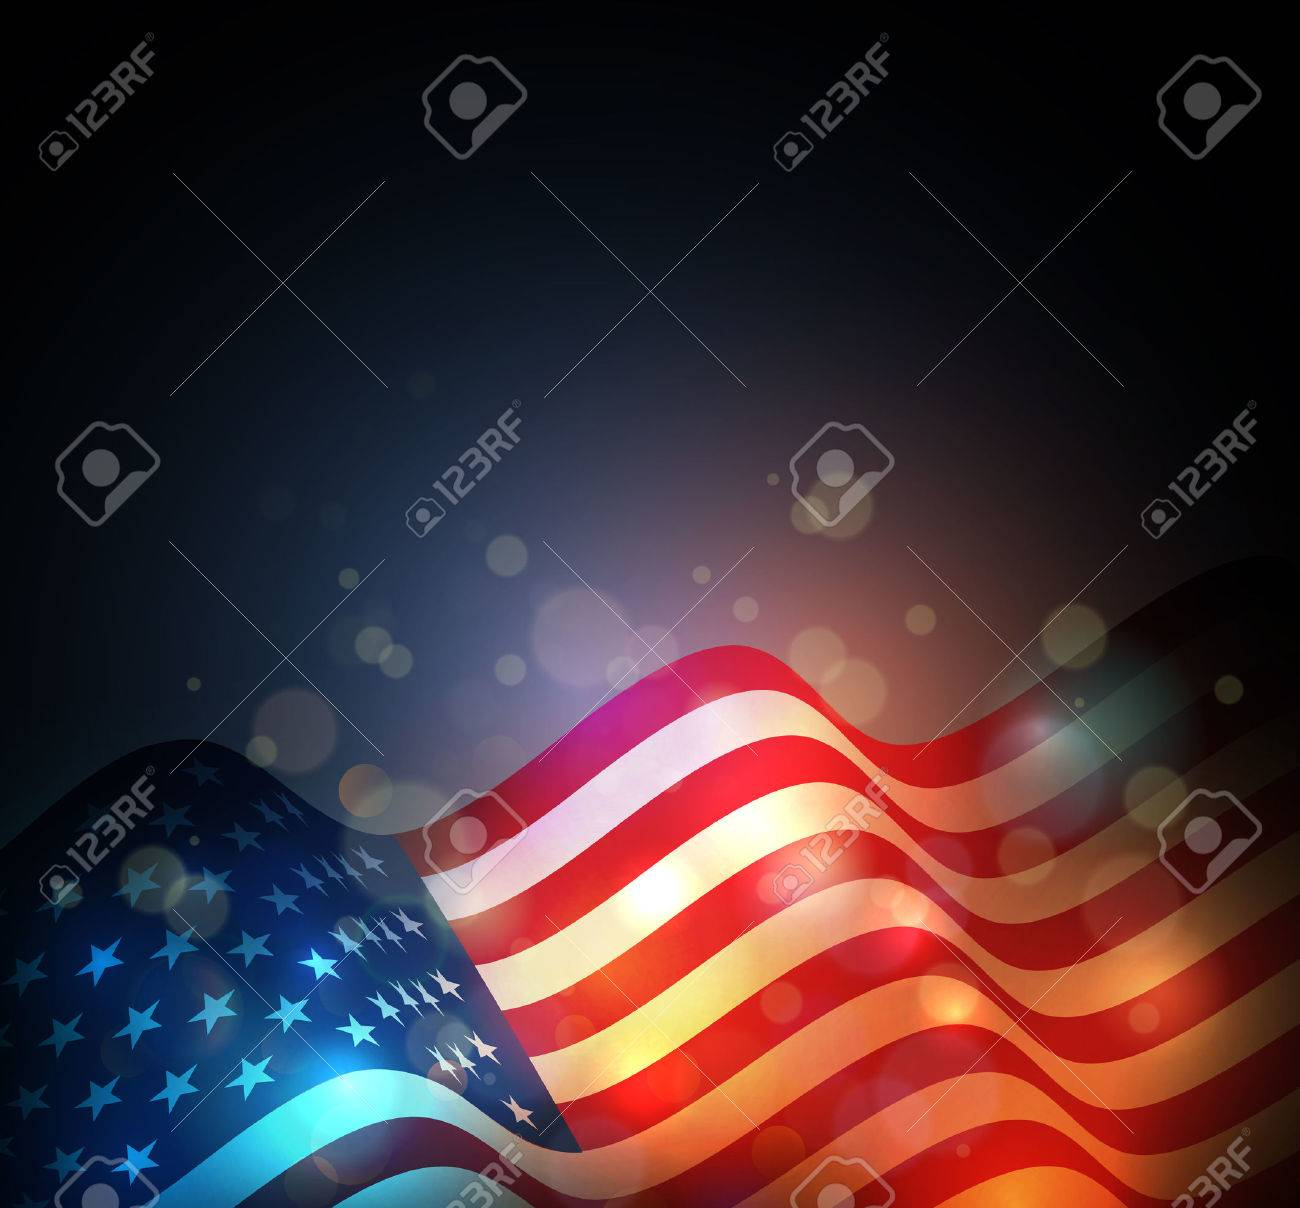 United States flag. USA Independence Day background. Fourth of July celebrate - 54493440